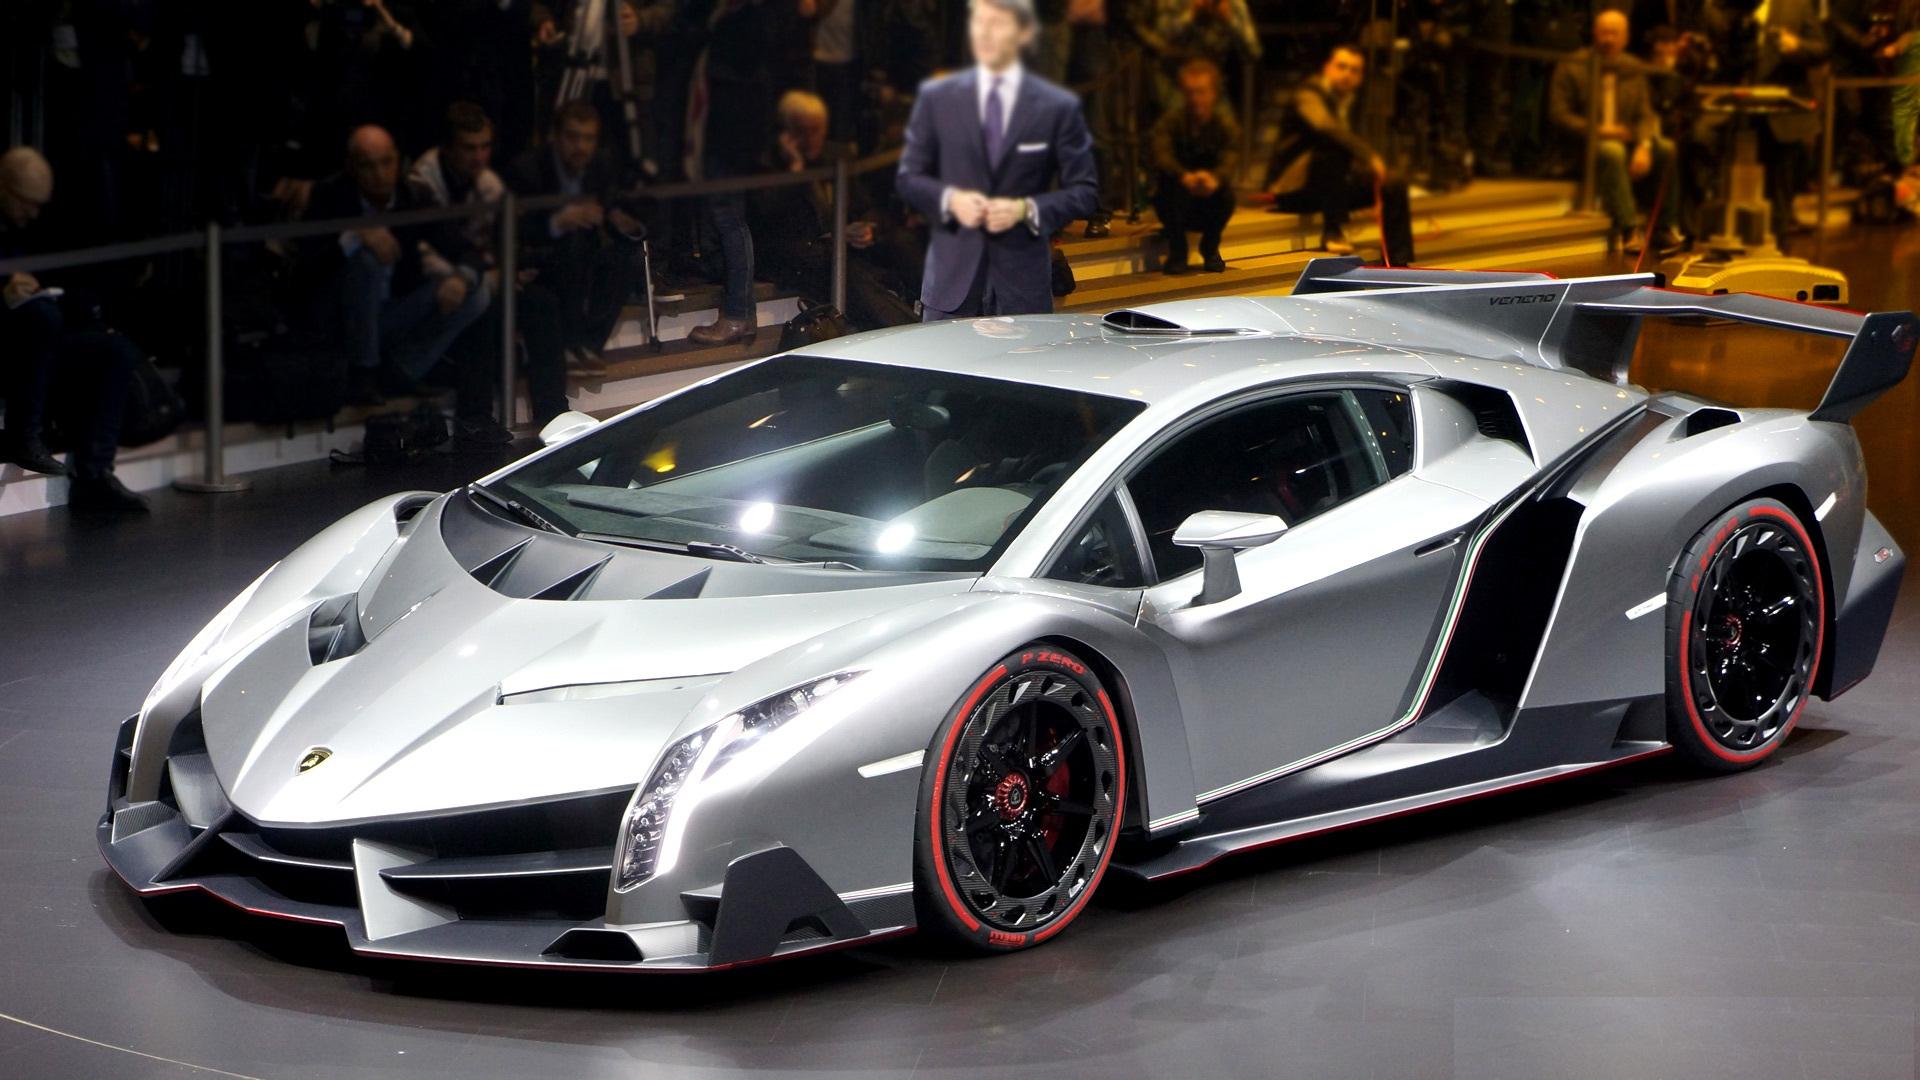 15 Lamborghini <b>Veneno HD Wallpapers</b>   Backgrounds - <b>Wallpaper</b> Abyss